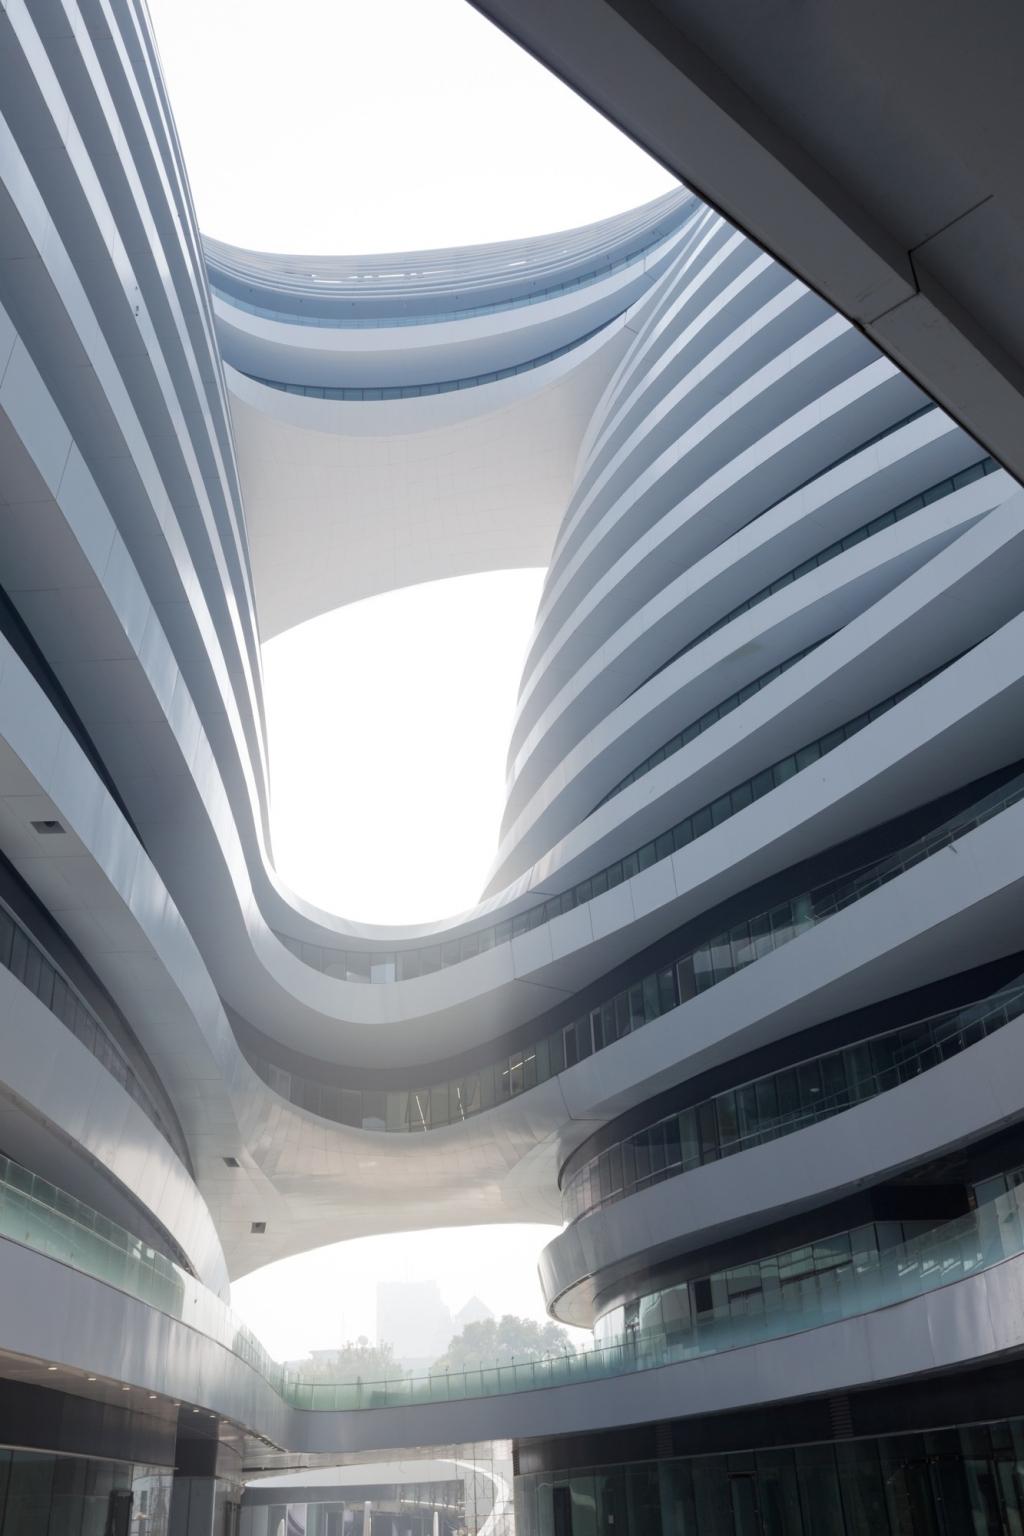 galaxy soho zaha hadid architects updated the superslice